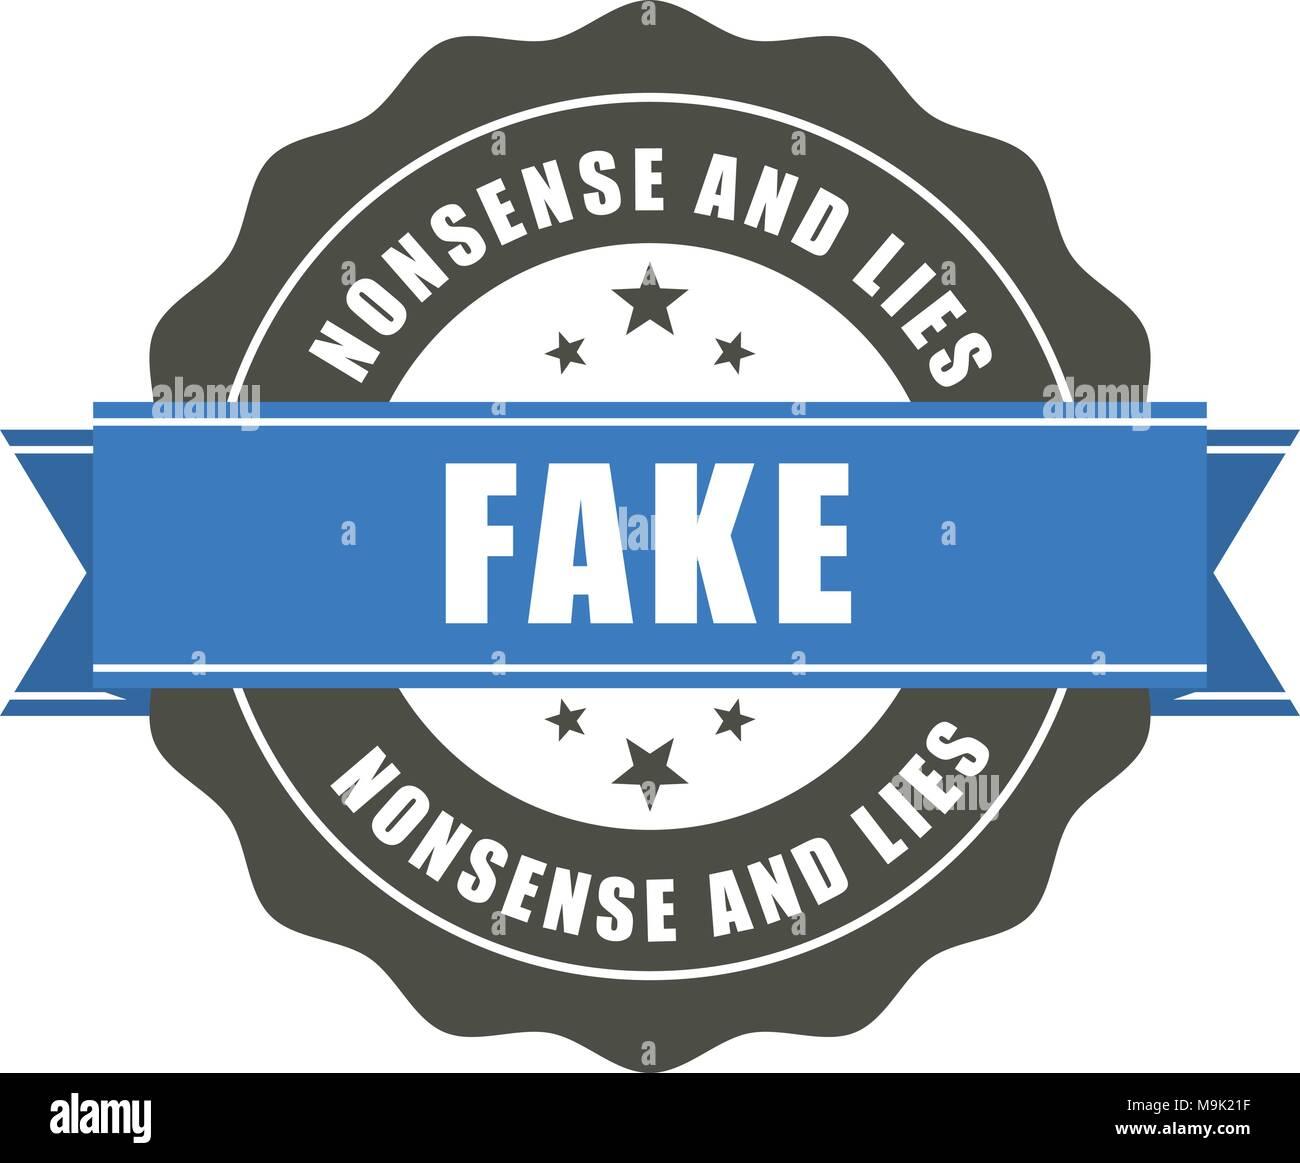 Fake badge - sticker with inscription Fake, falsification concept - Stock Image